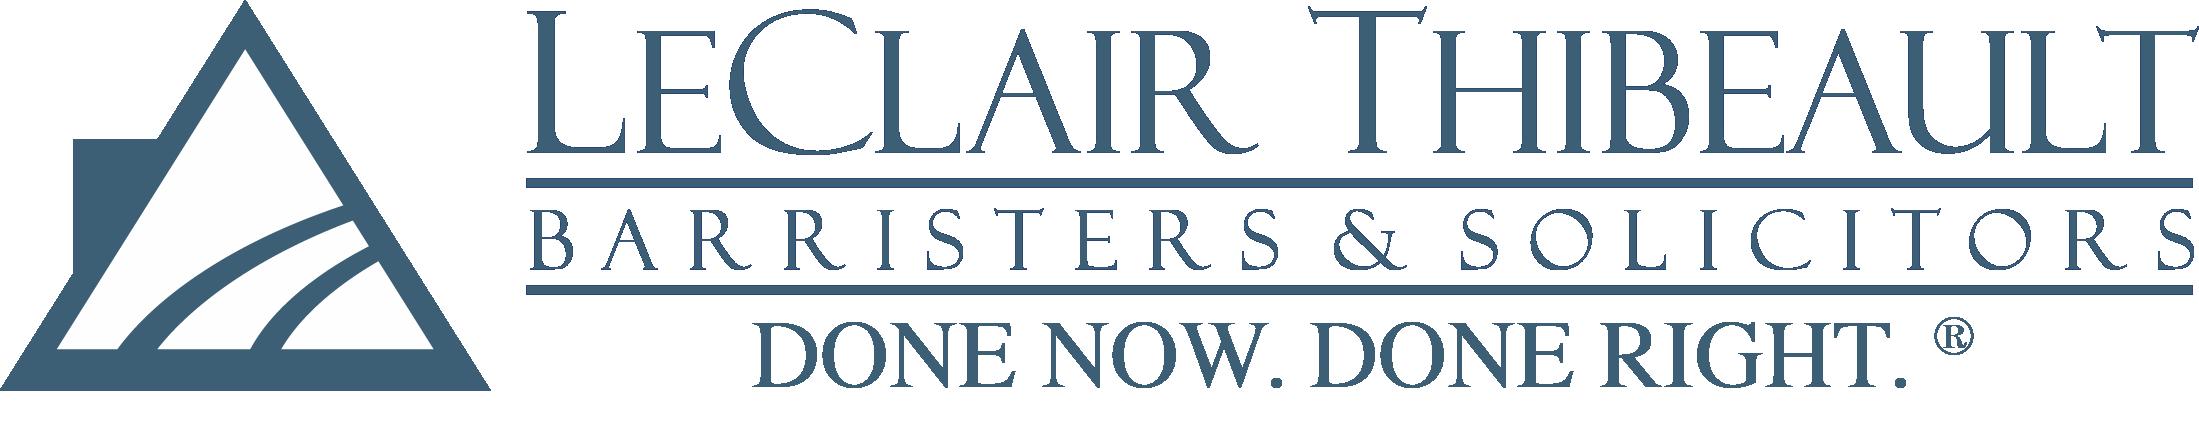 free legal advice calgary